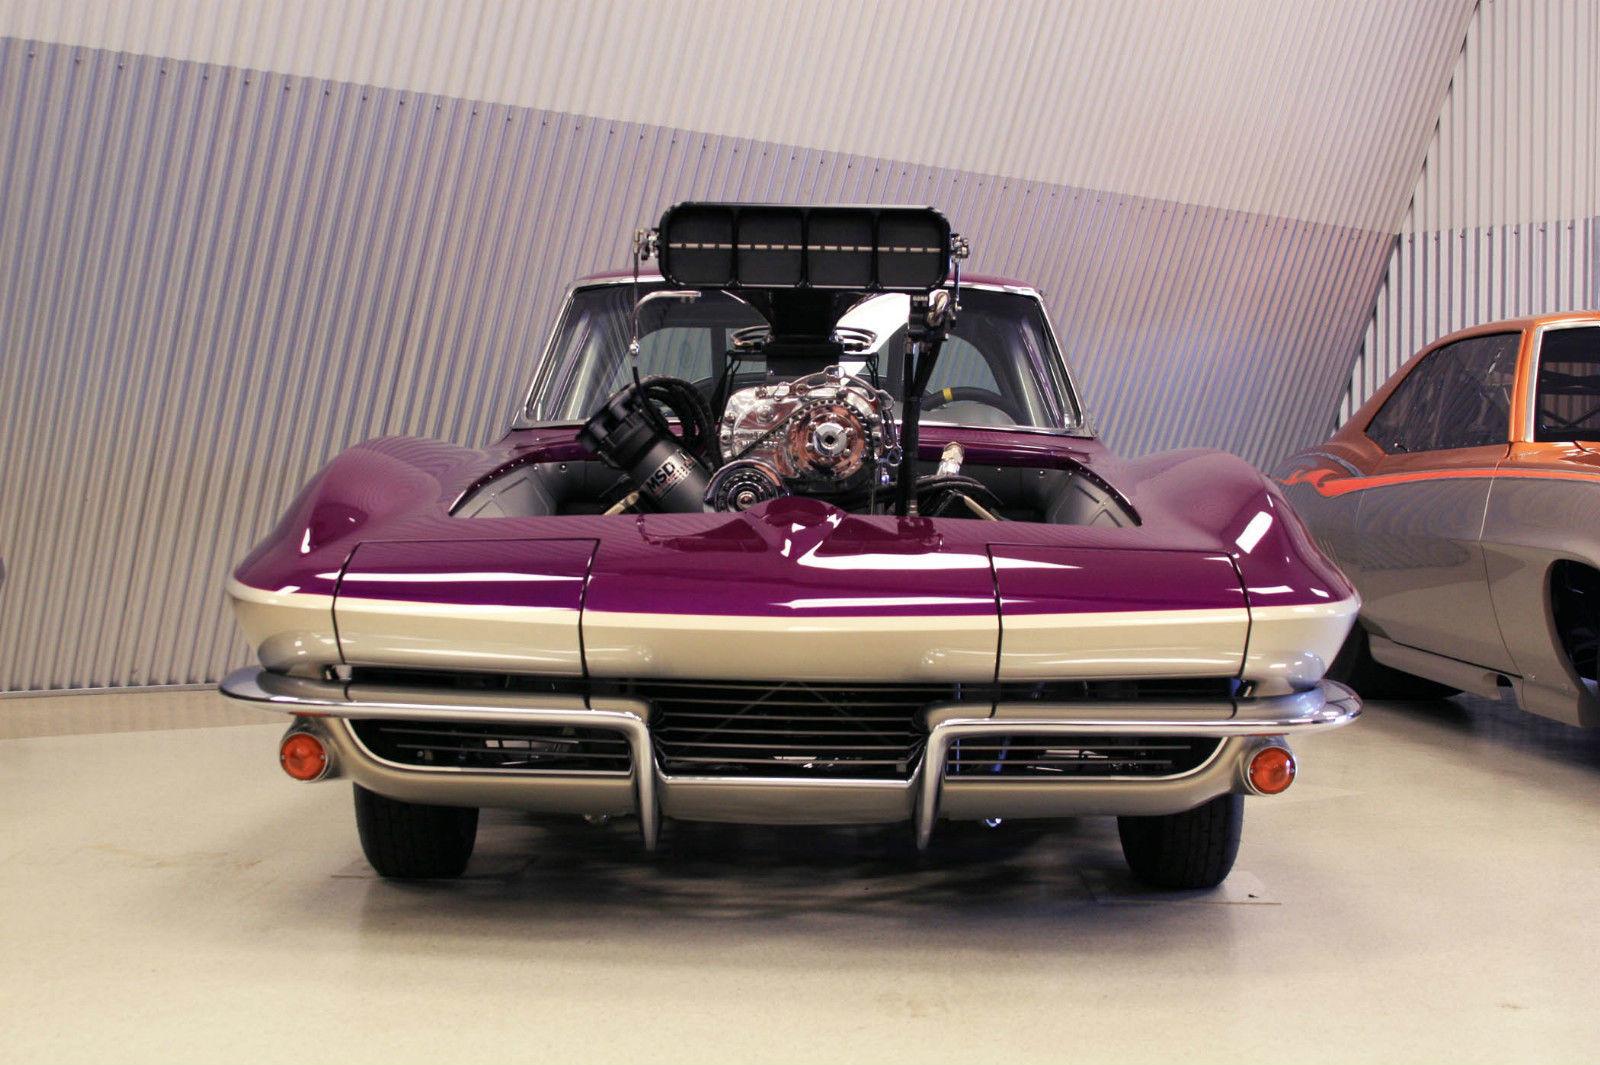 1963 Corvette Pro-Street 513 ci Keith Black Hemi Rad Rides by Troy Build-14